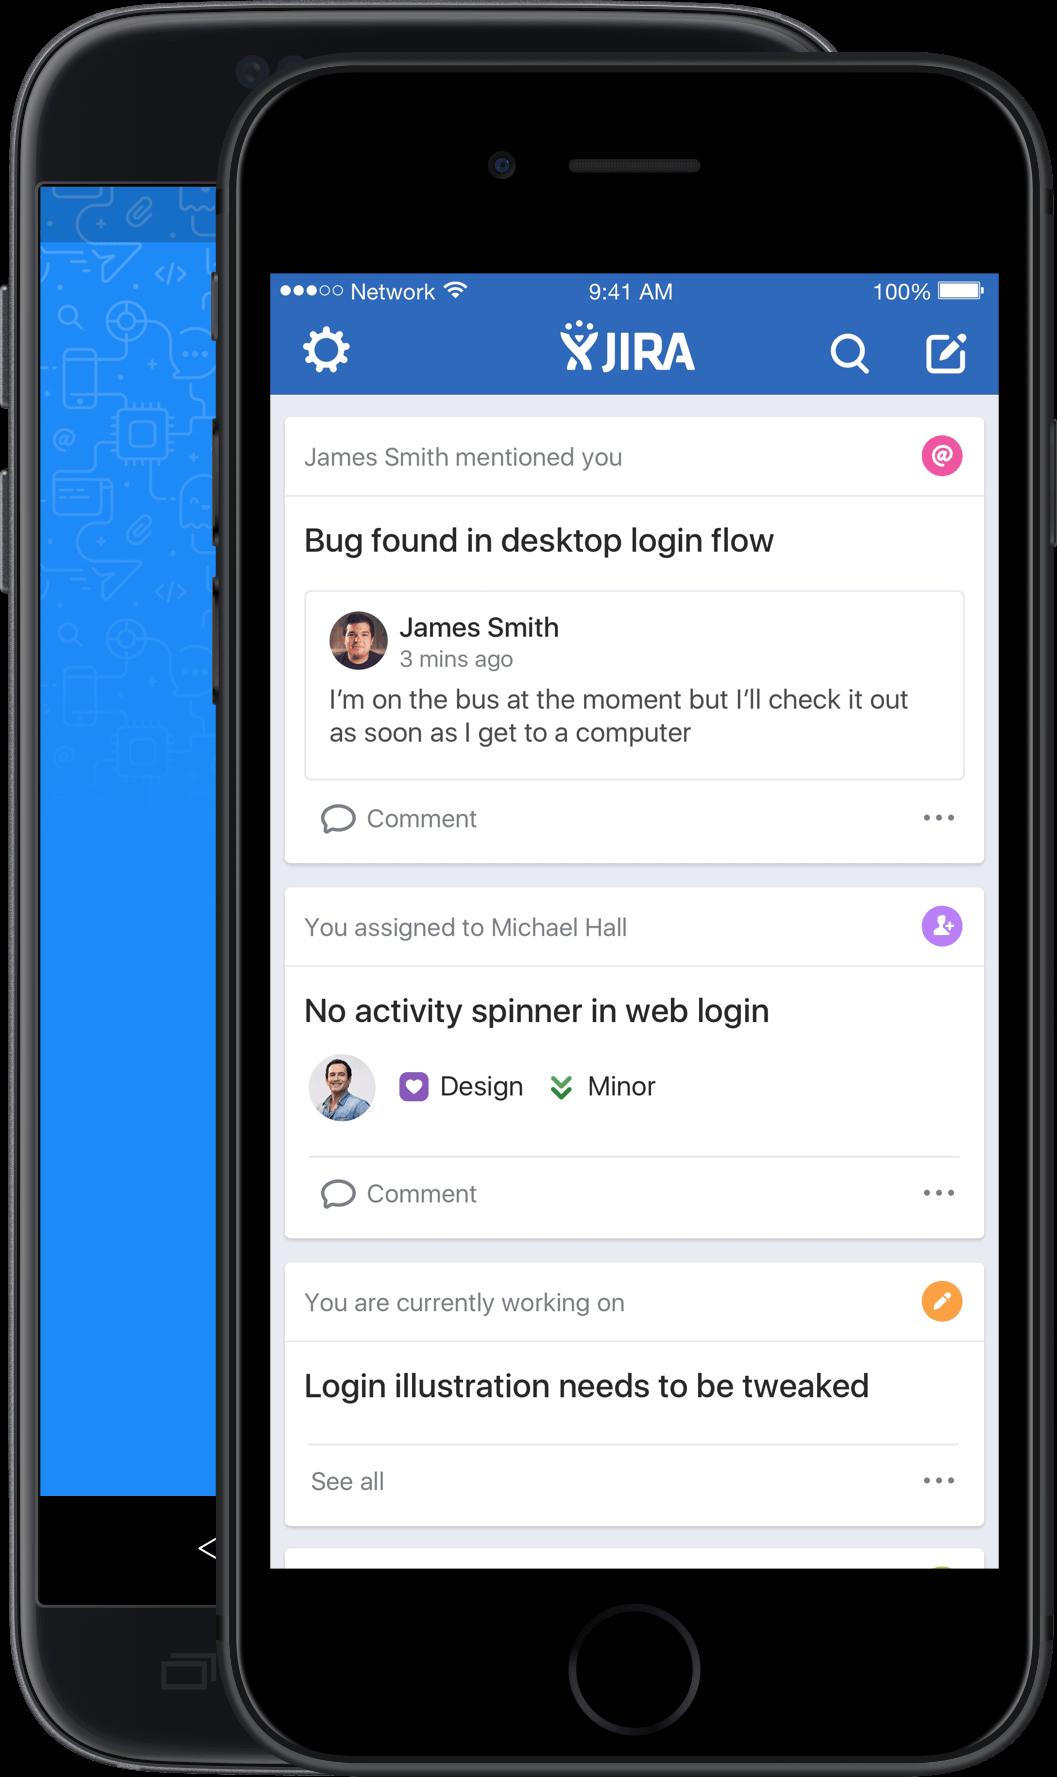 JIRA Software for iOS - Home screen